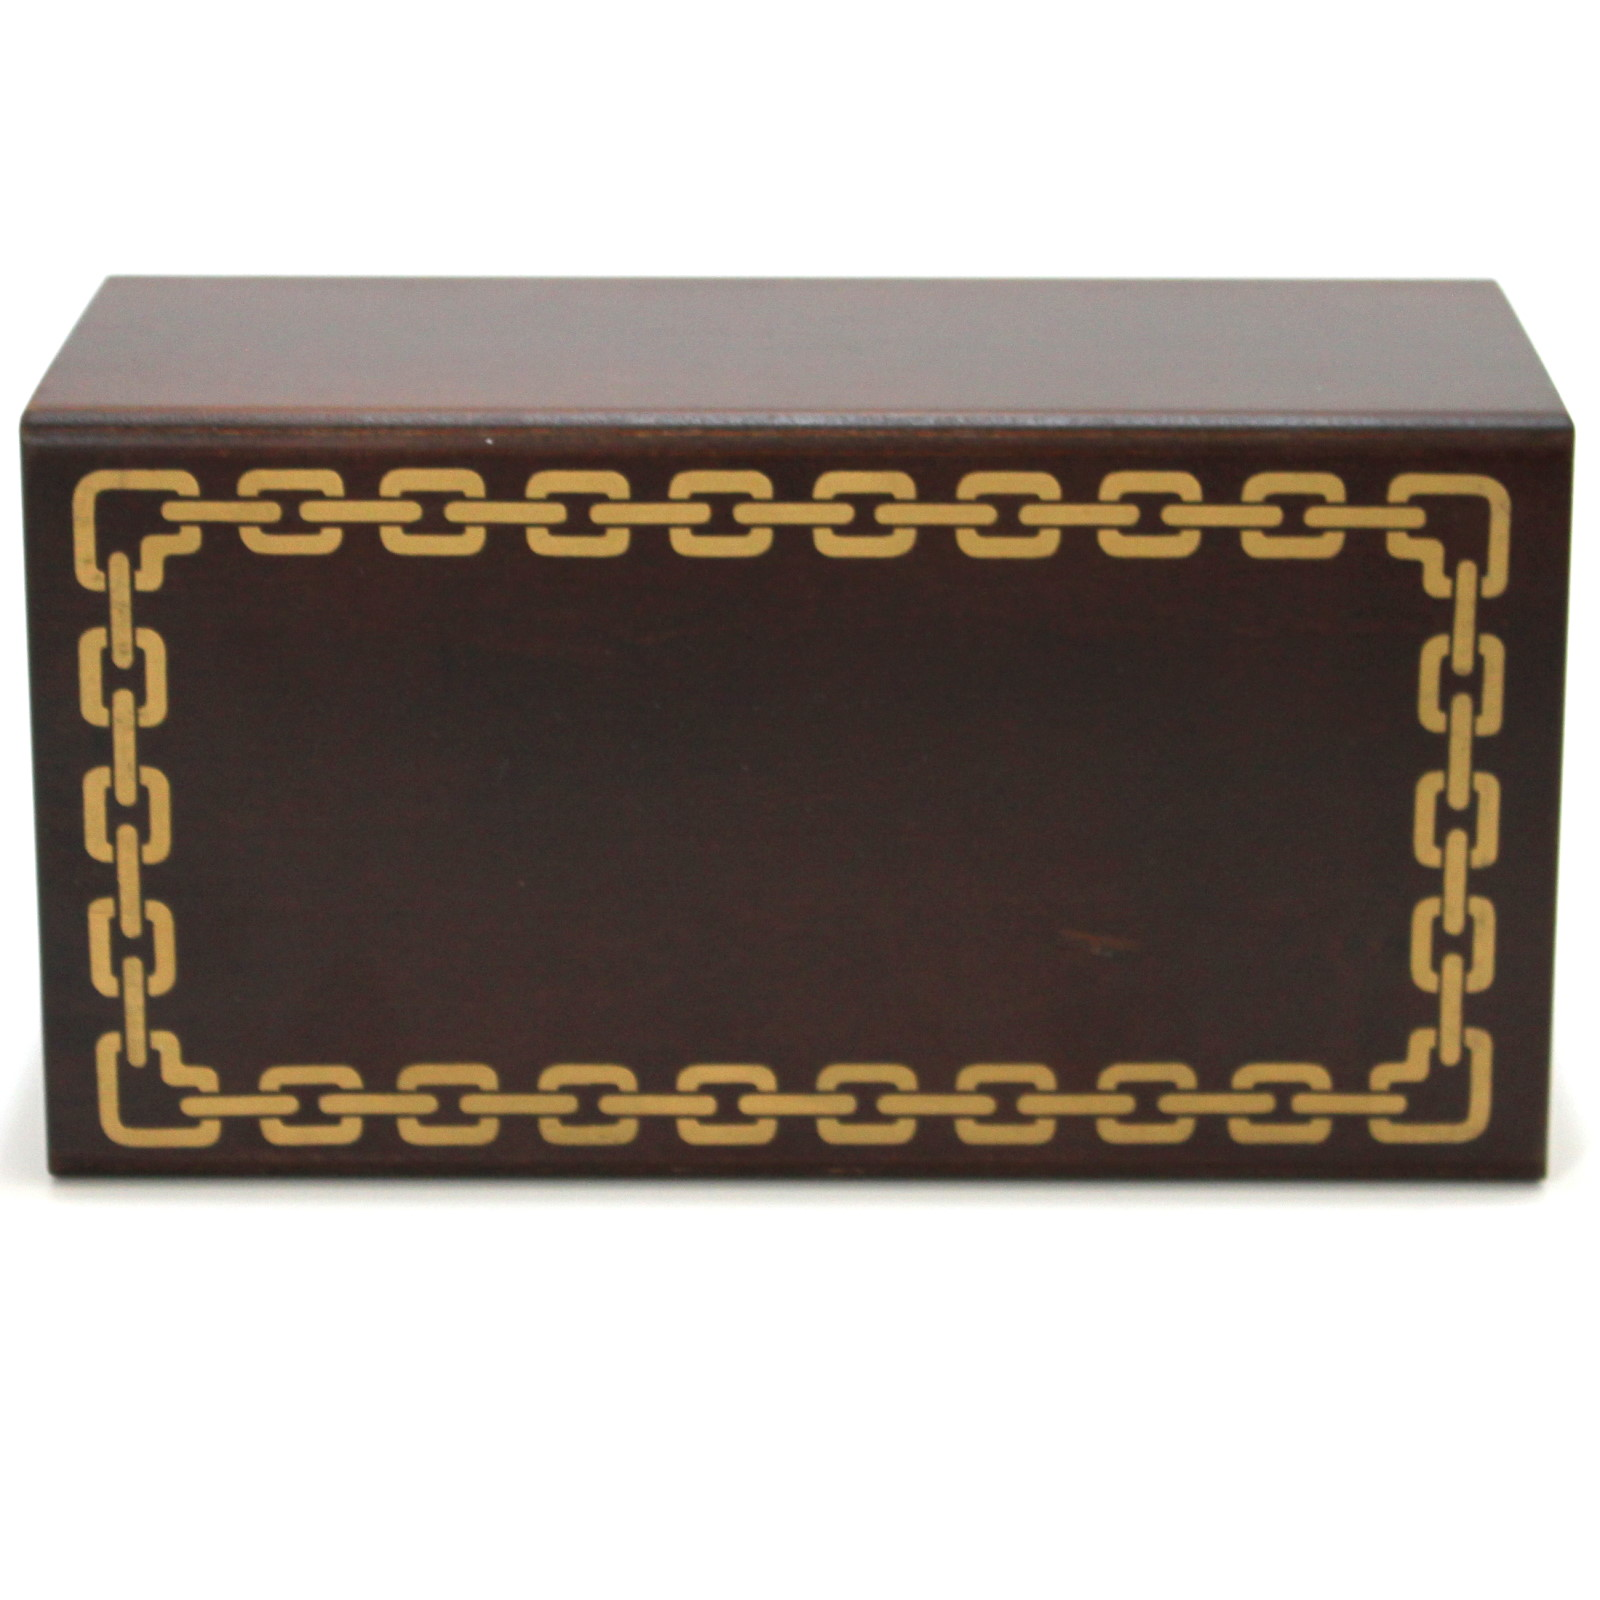 Ukiyo box (Western style) by Mikame Craft